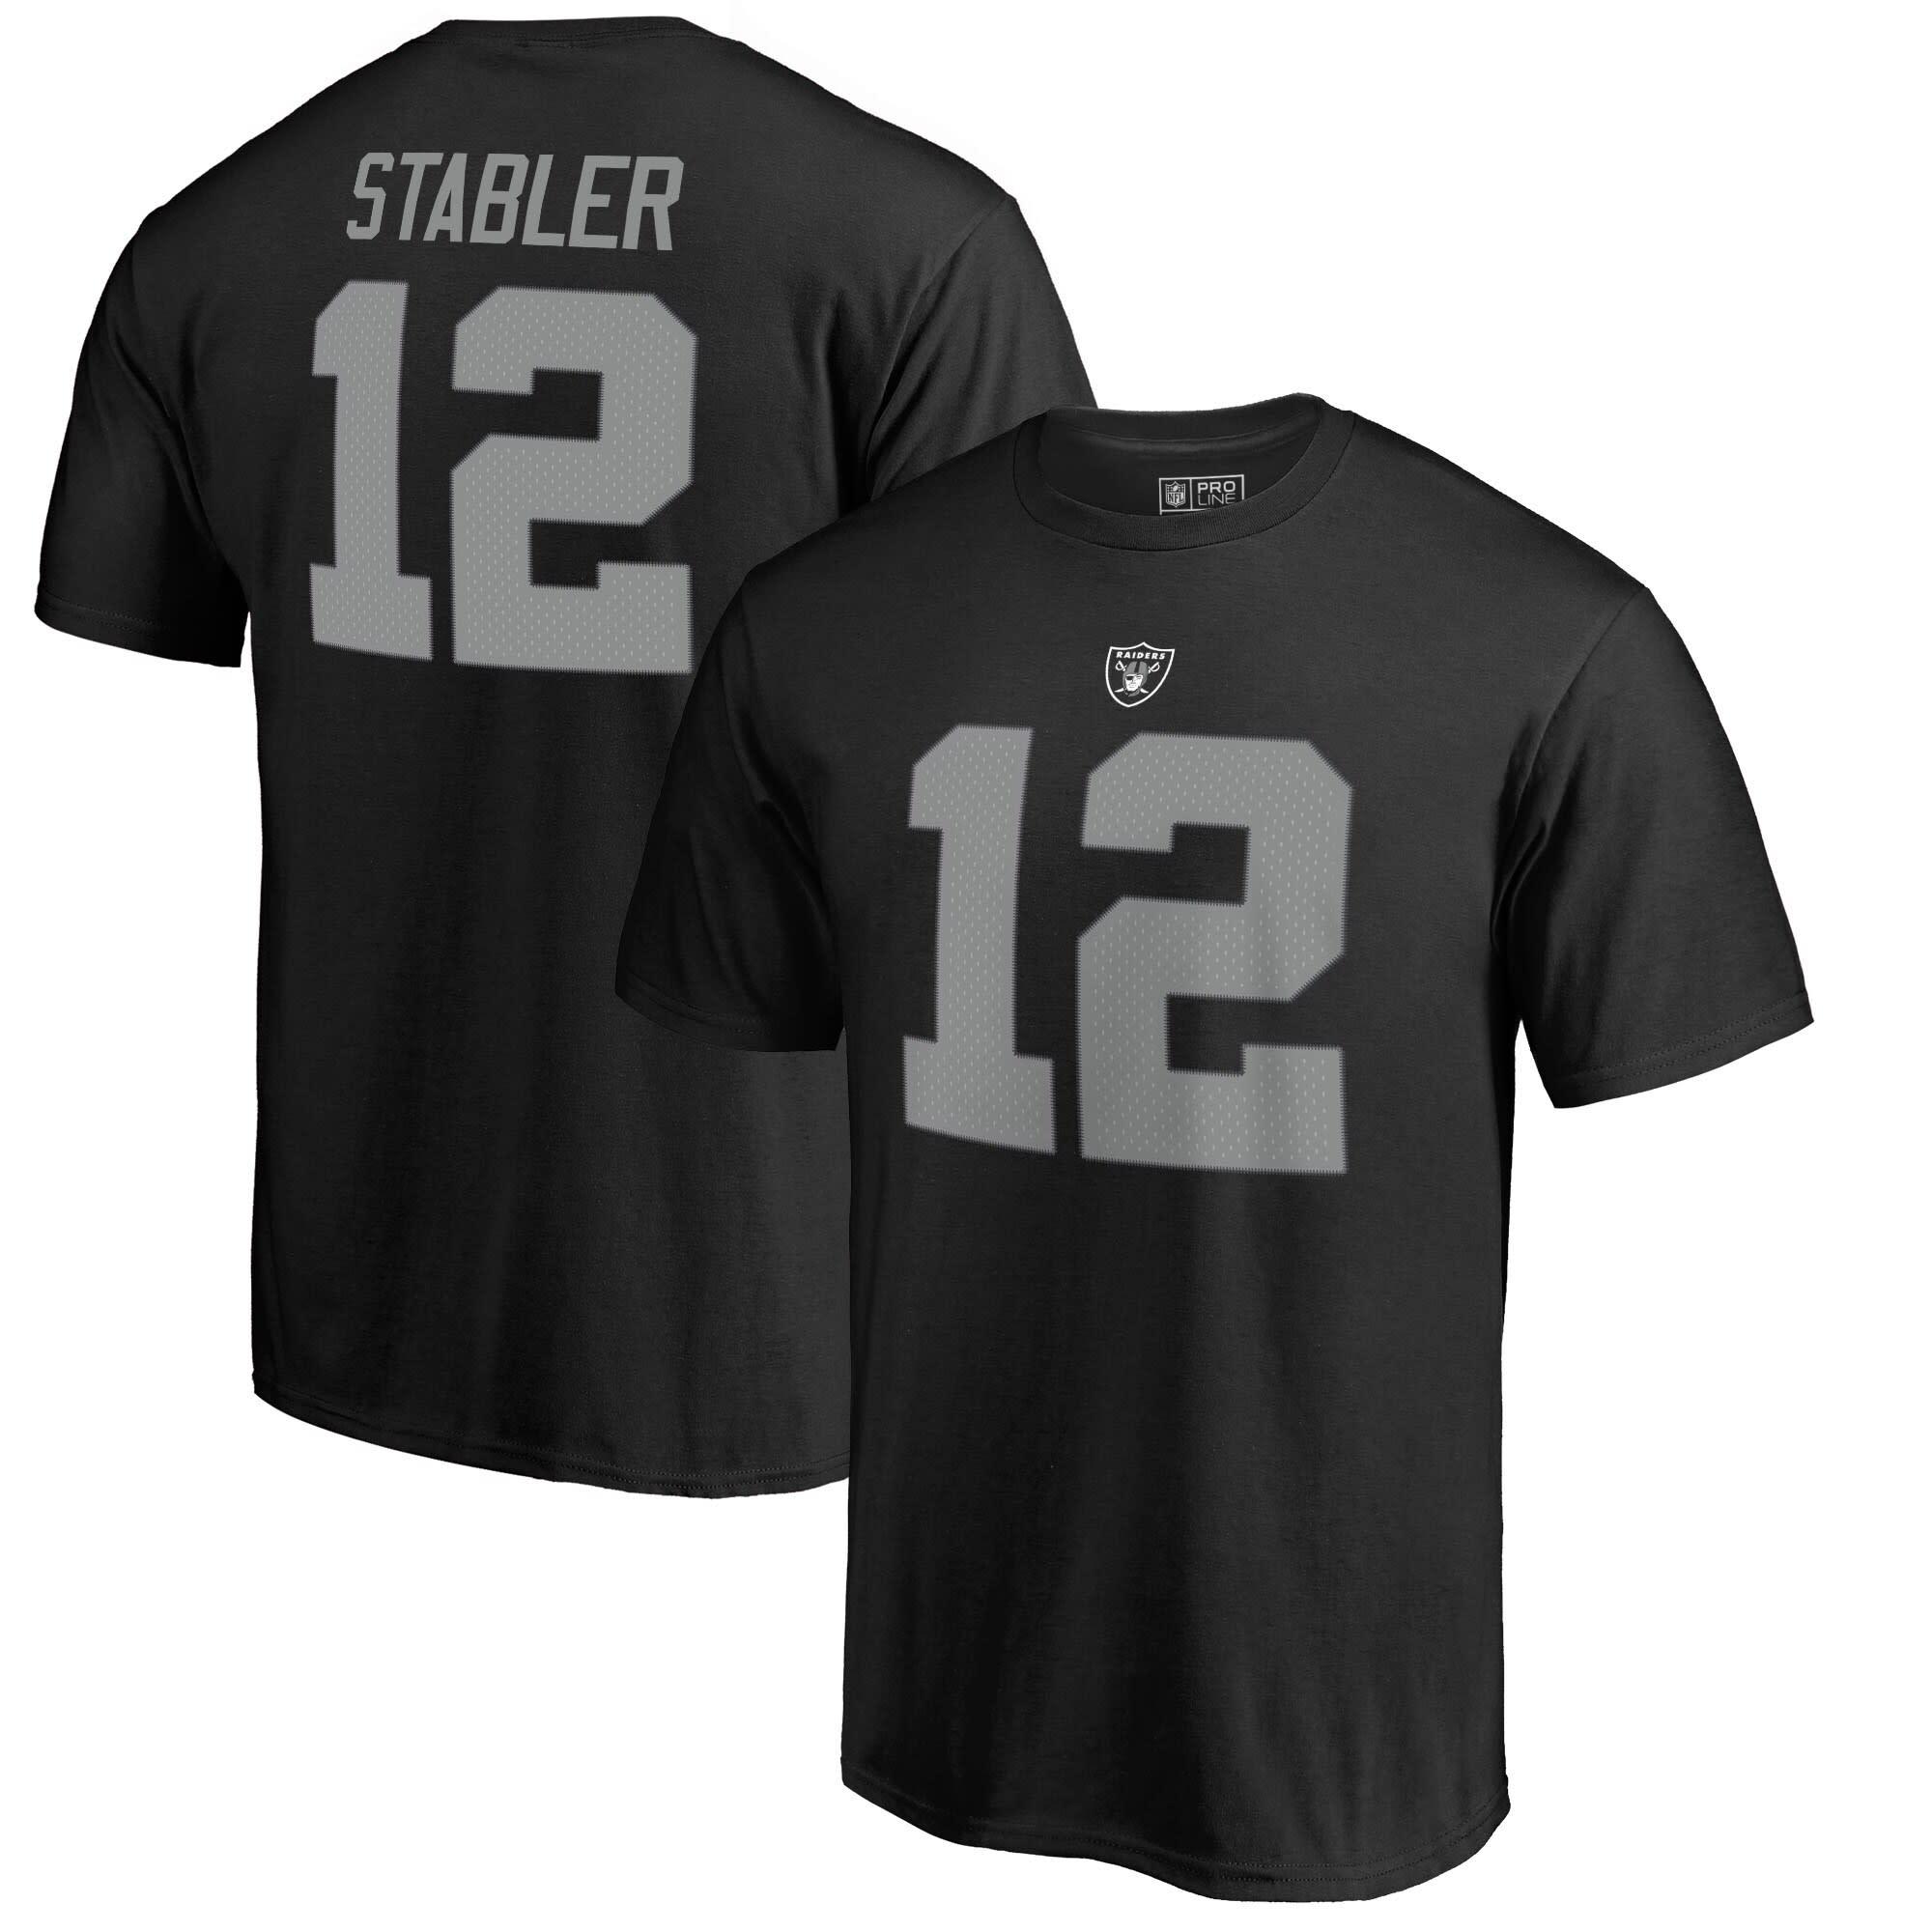 Items every Las Vegas Raiders fan needs for 2021